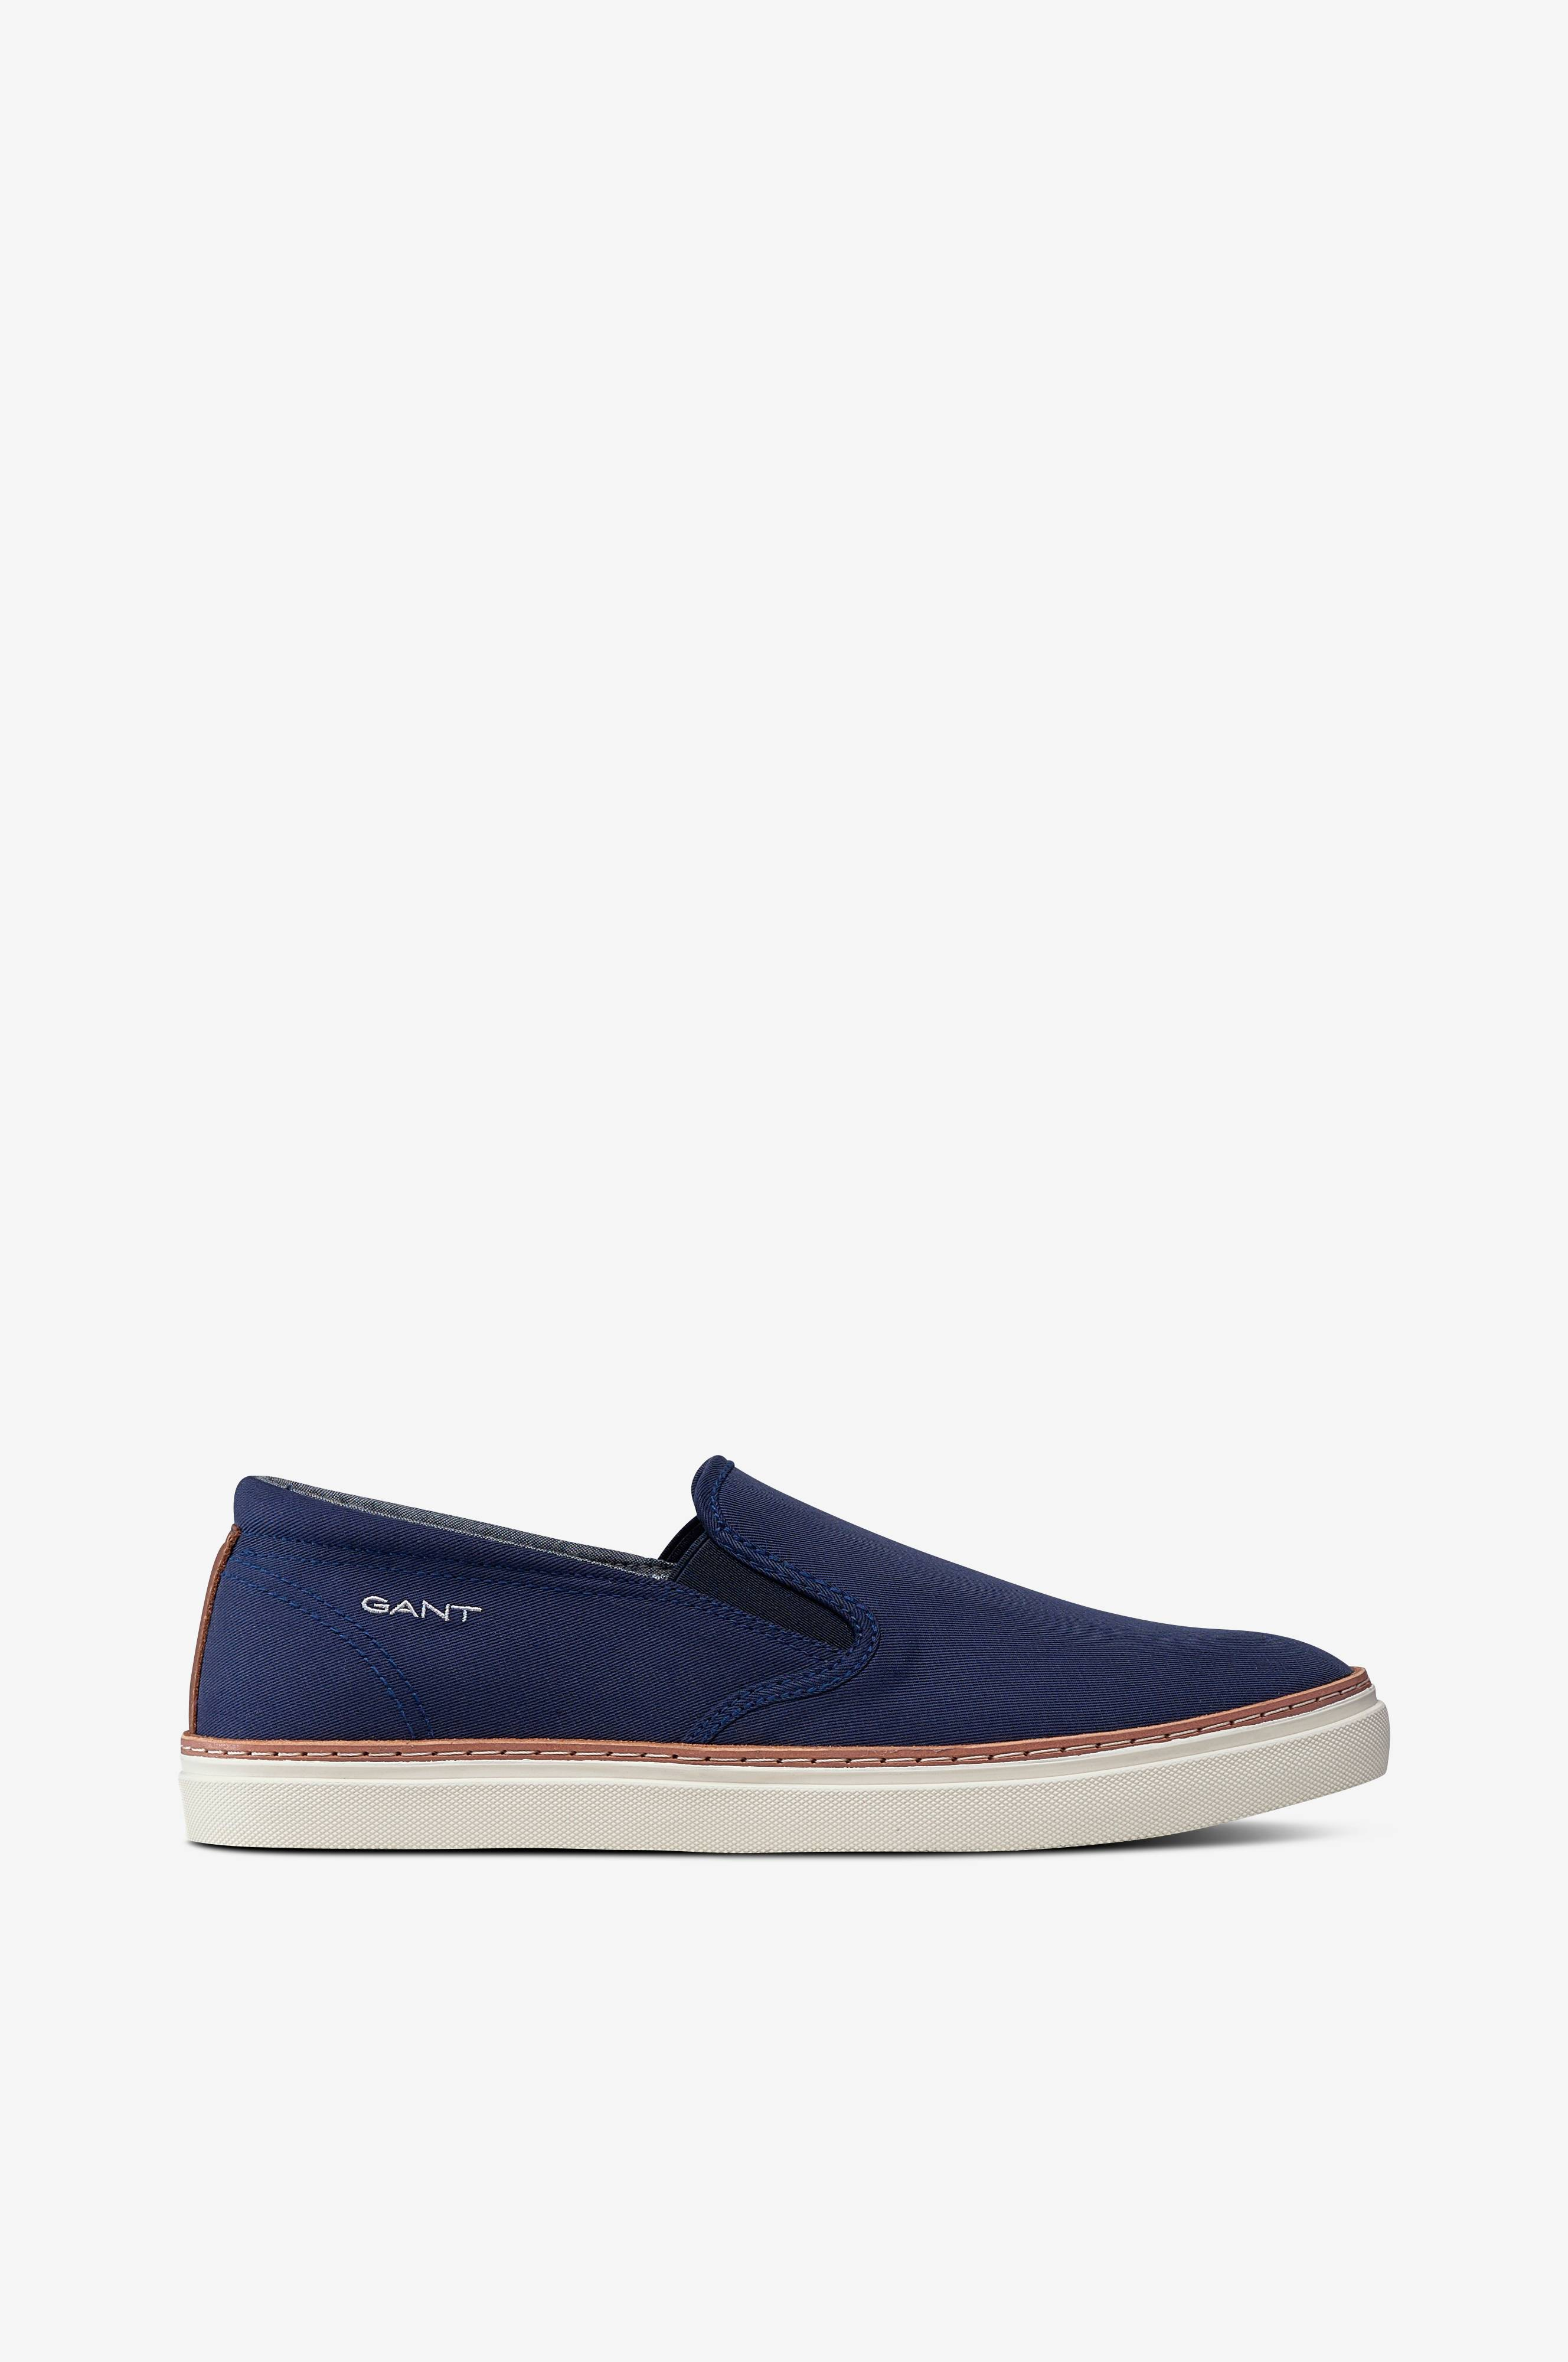 Gant Sneakers Bari Slip on Blå Herre Ellos.no